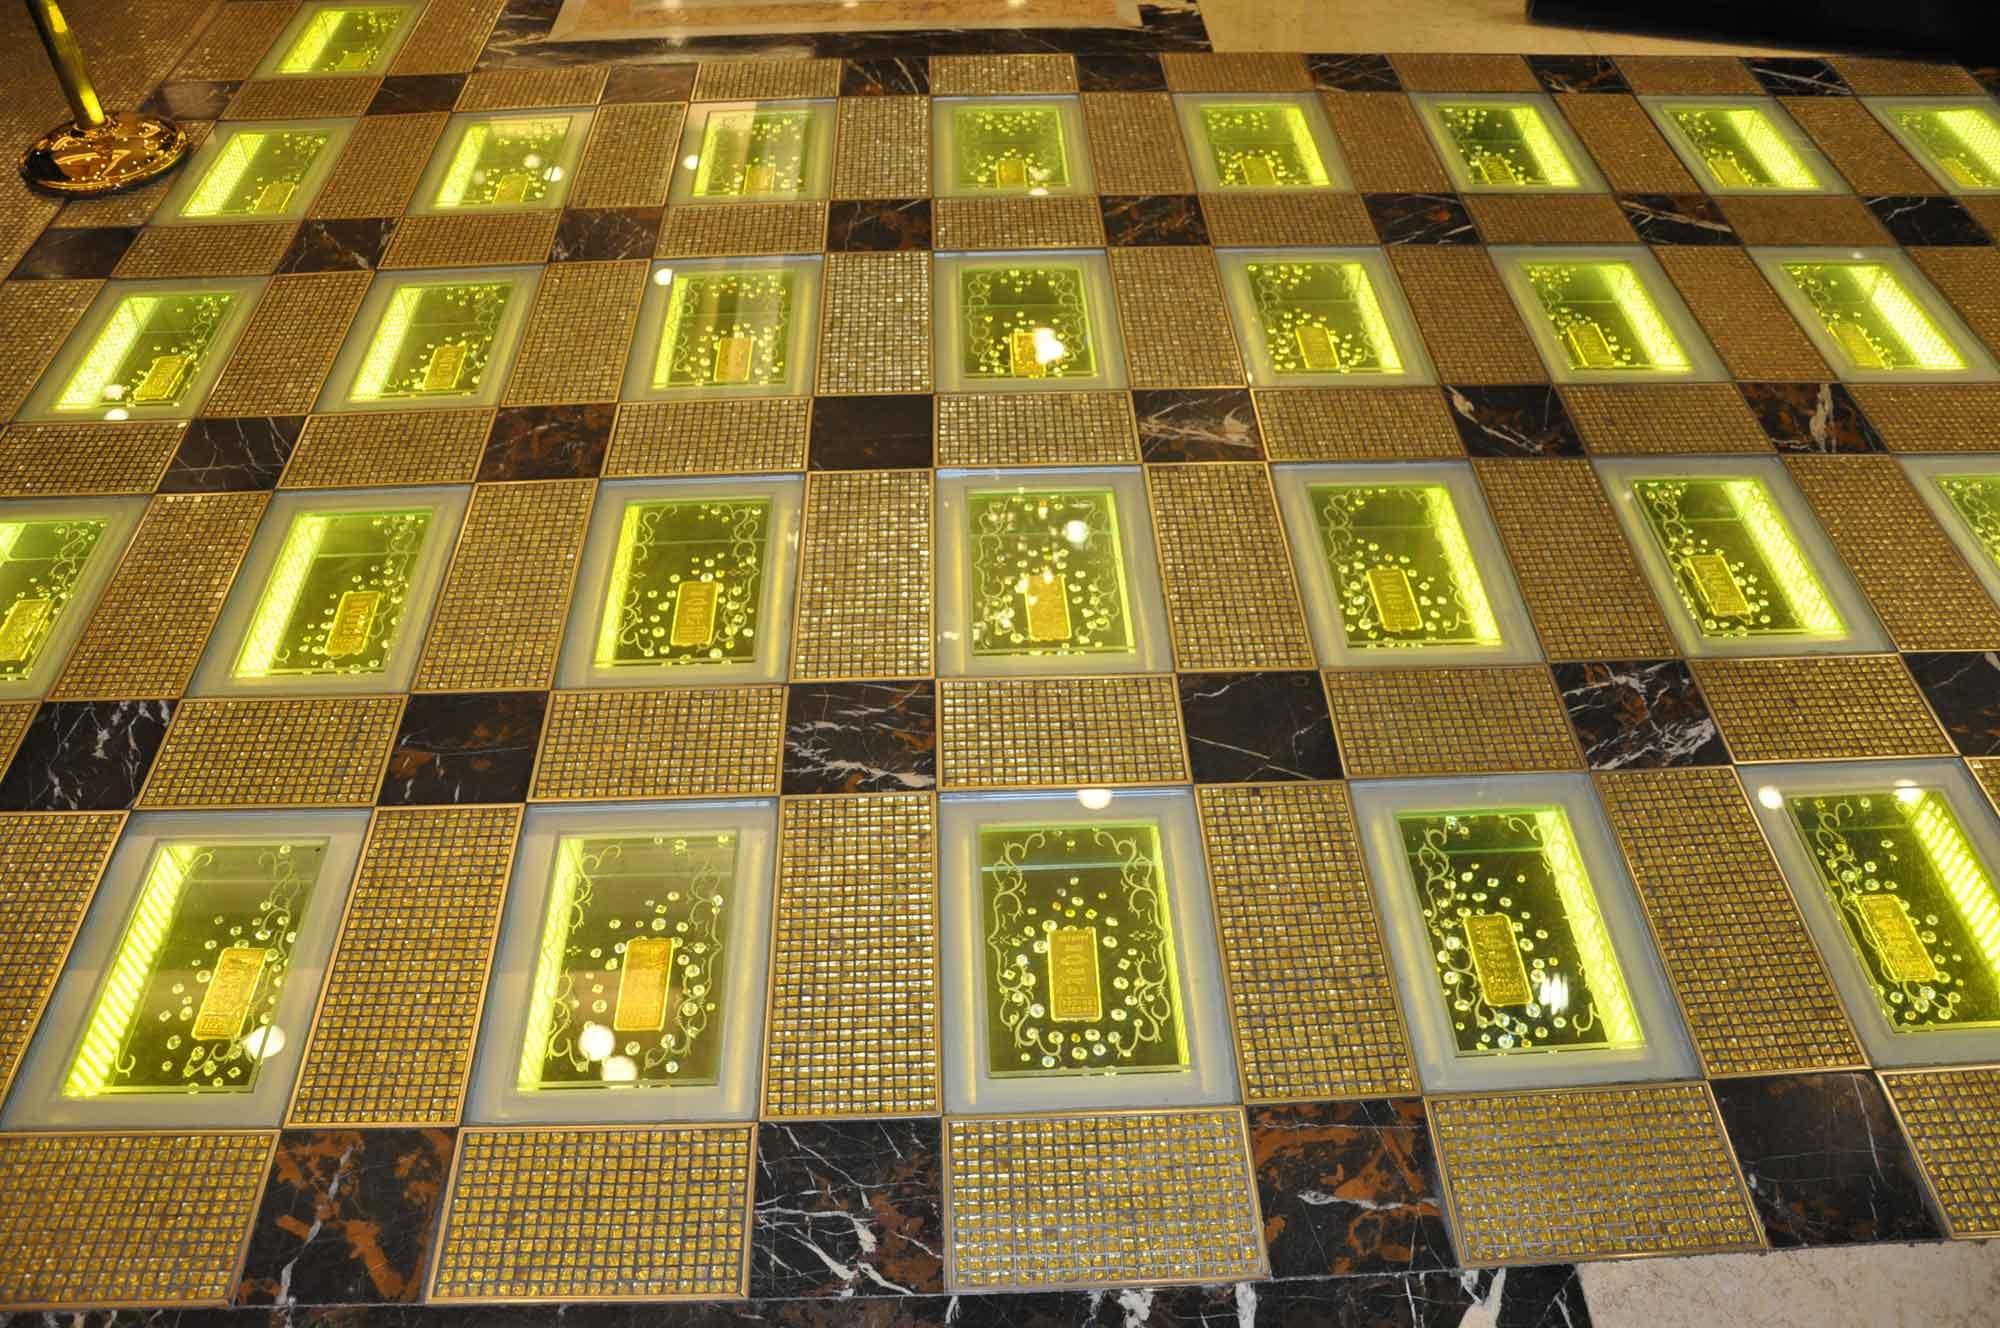 Grand Emperor Hotel bars of gold